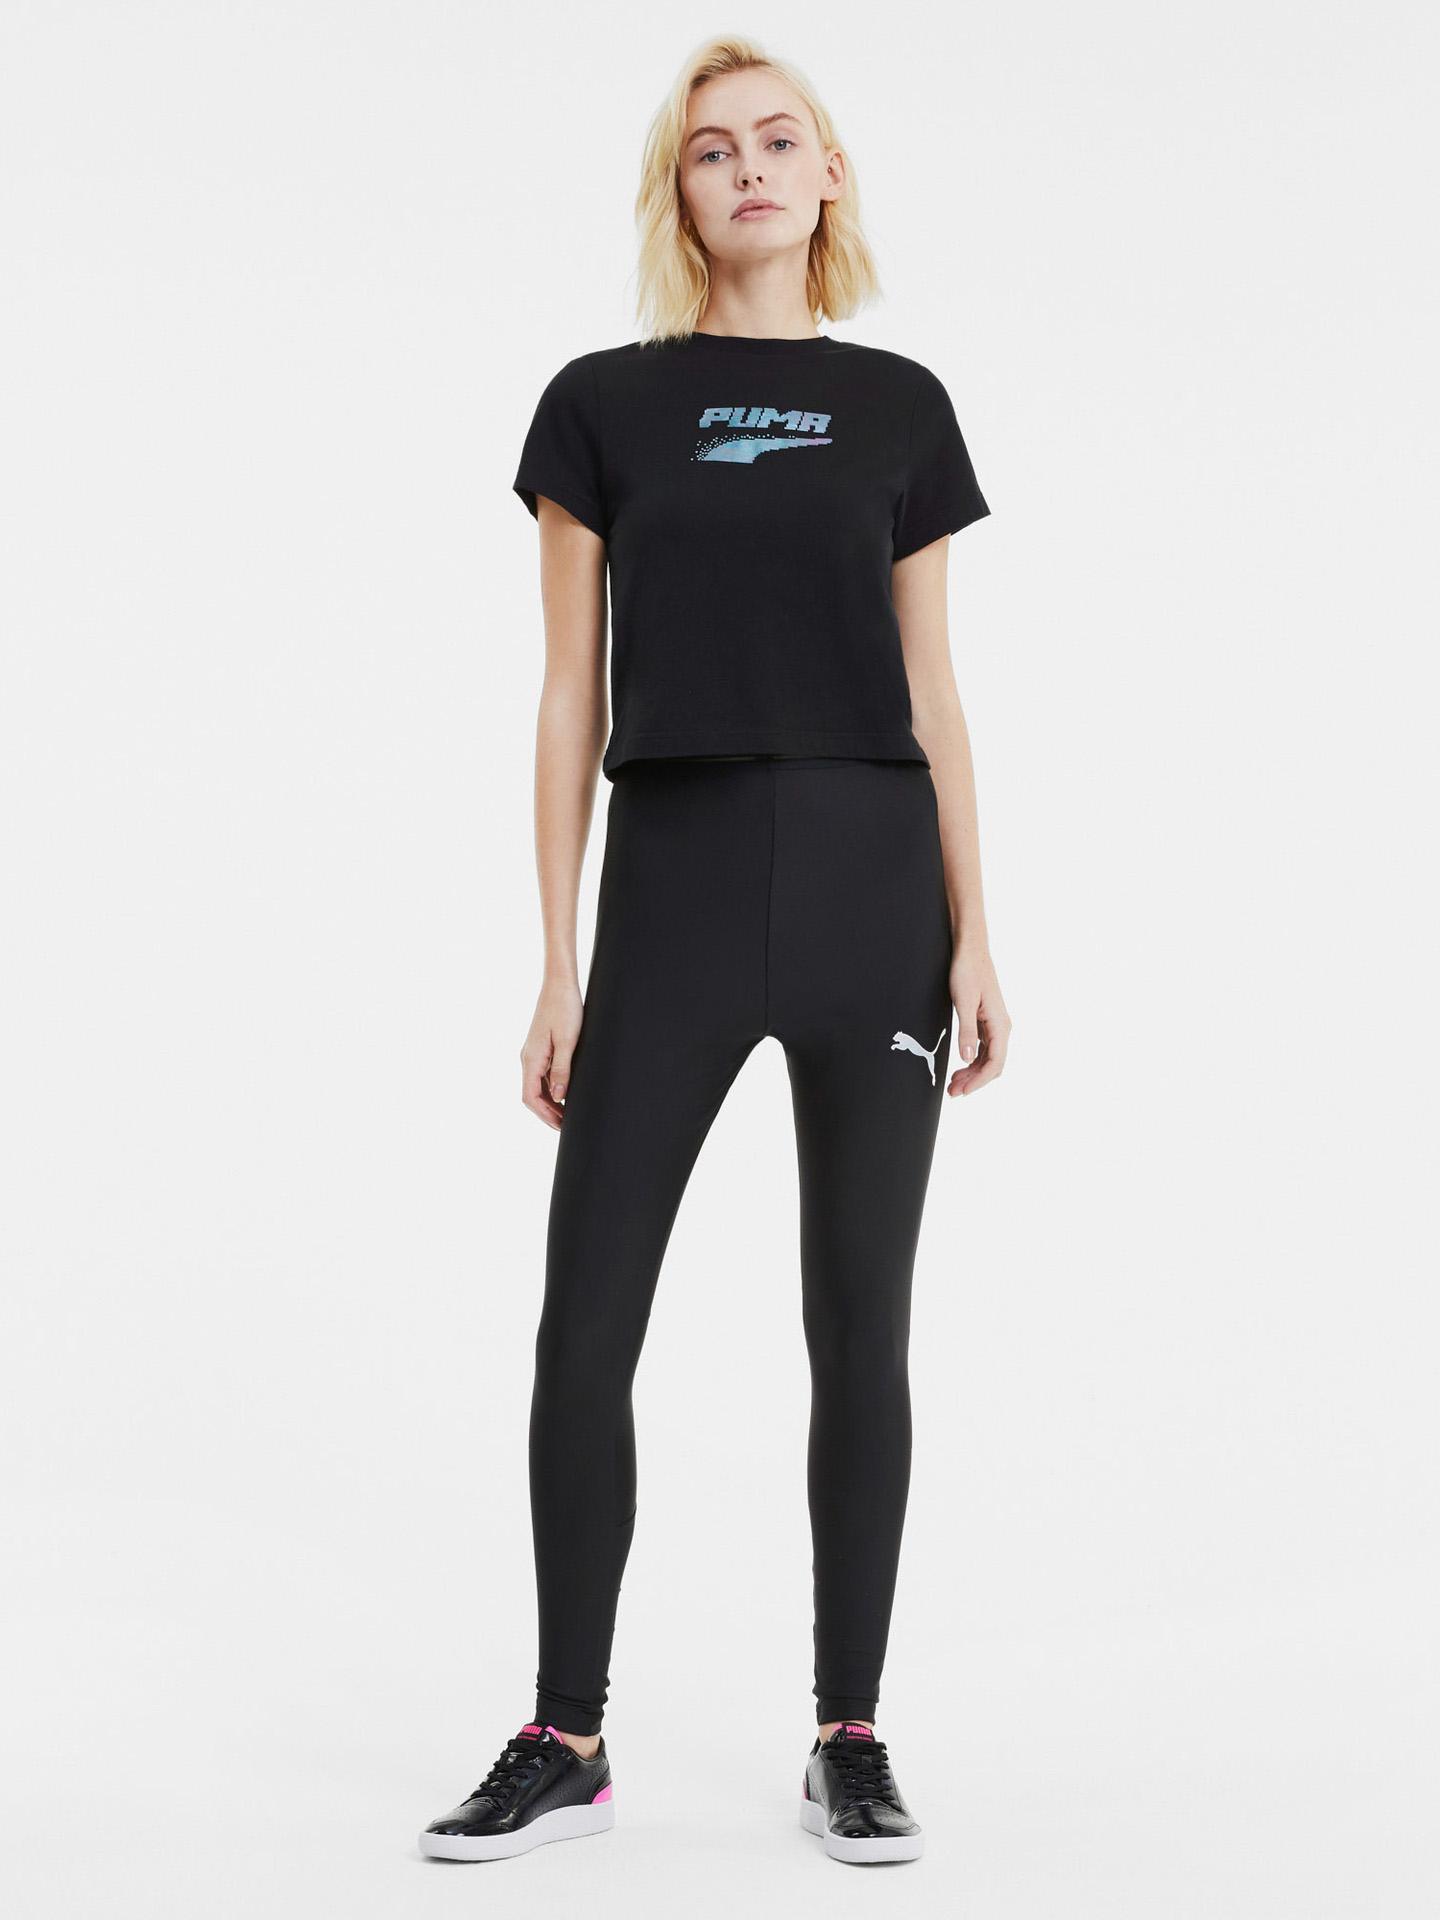 Puma černé dámské tričko Evide Graphic